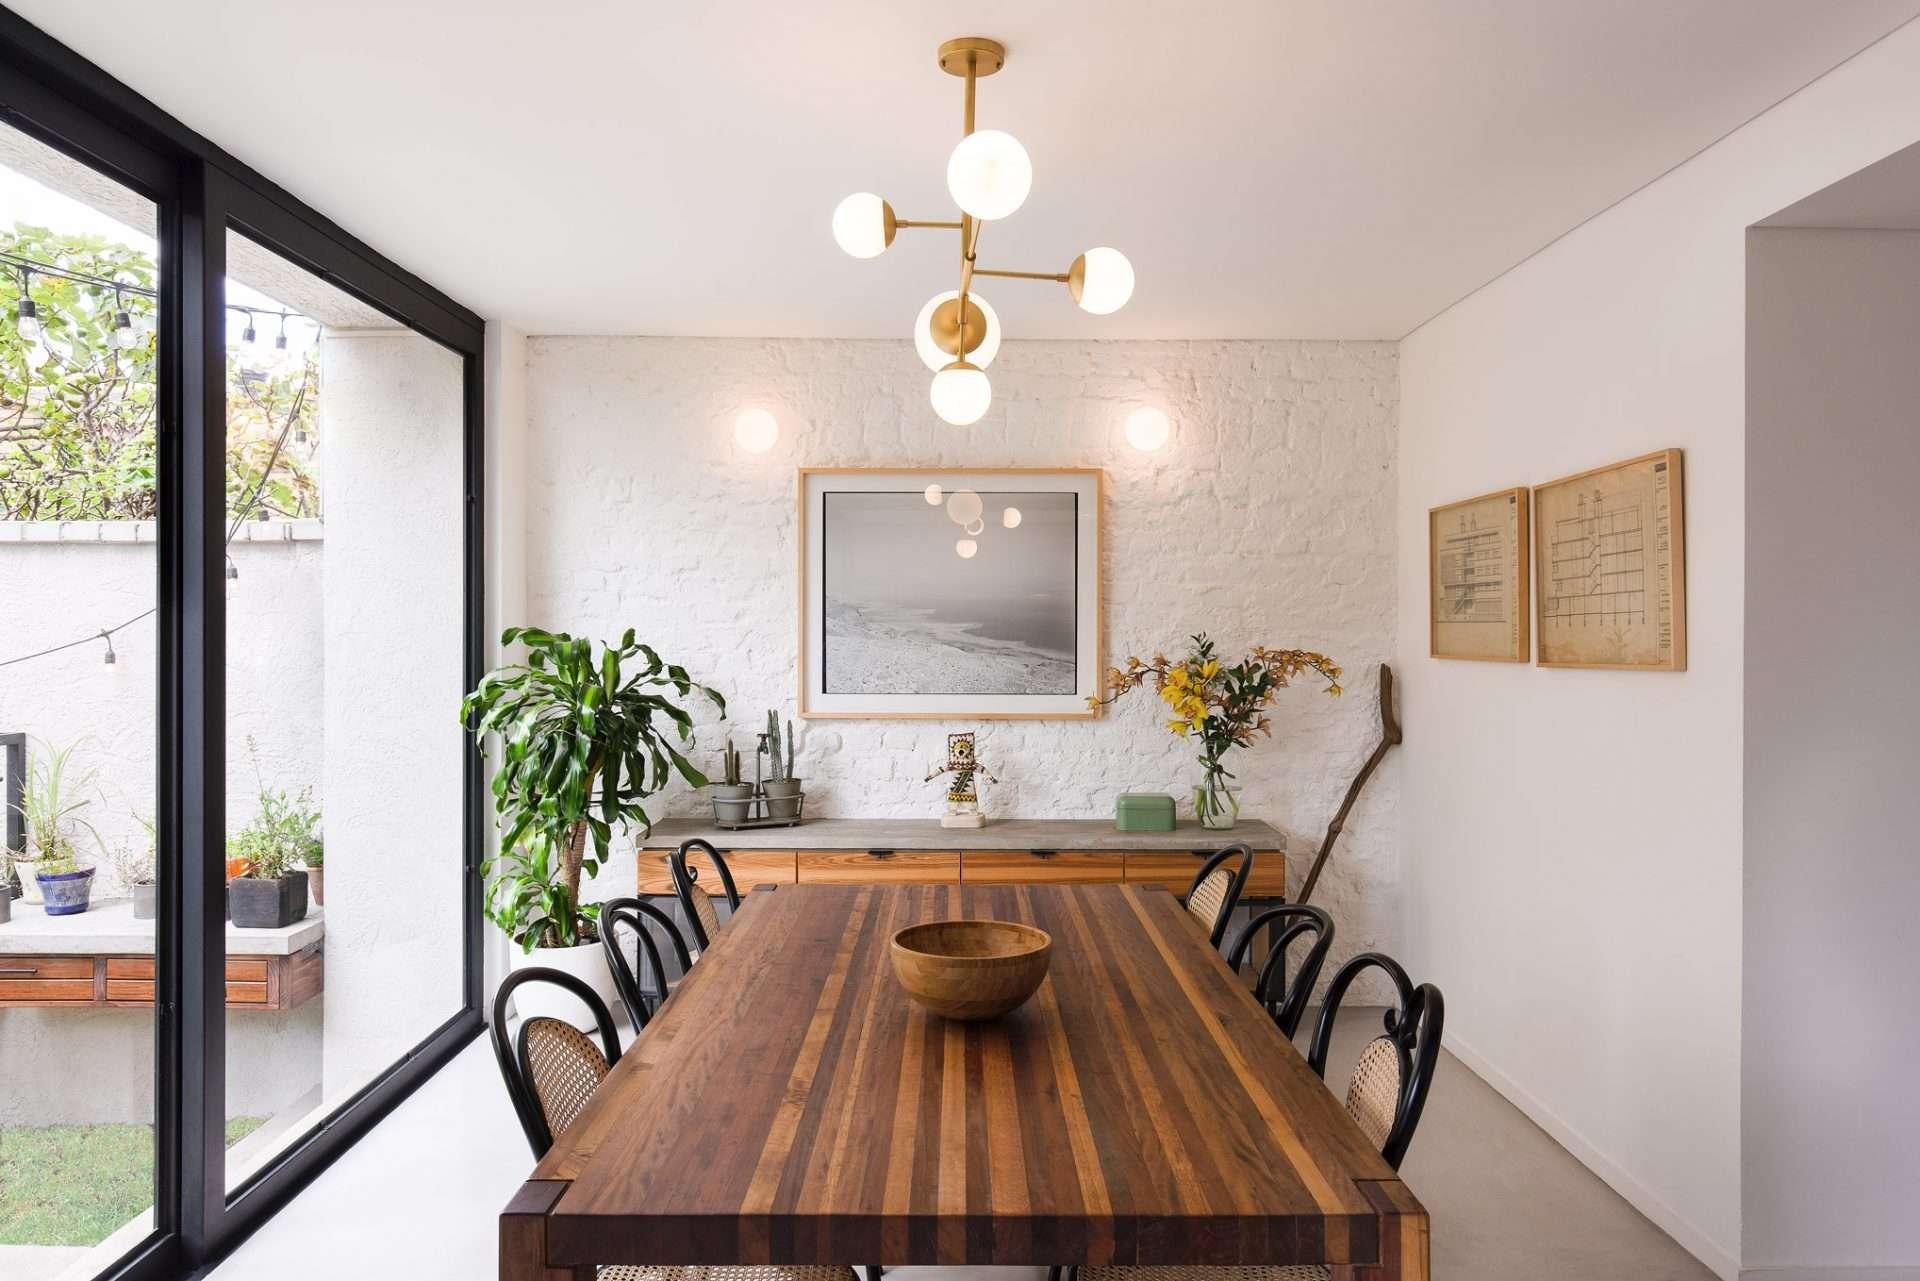 11.oberlaenderarquitectos.arquitectura.simonboschphotography.simon.bosch.bogota.interior.habitar